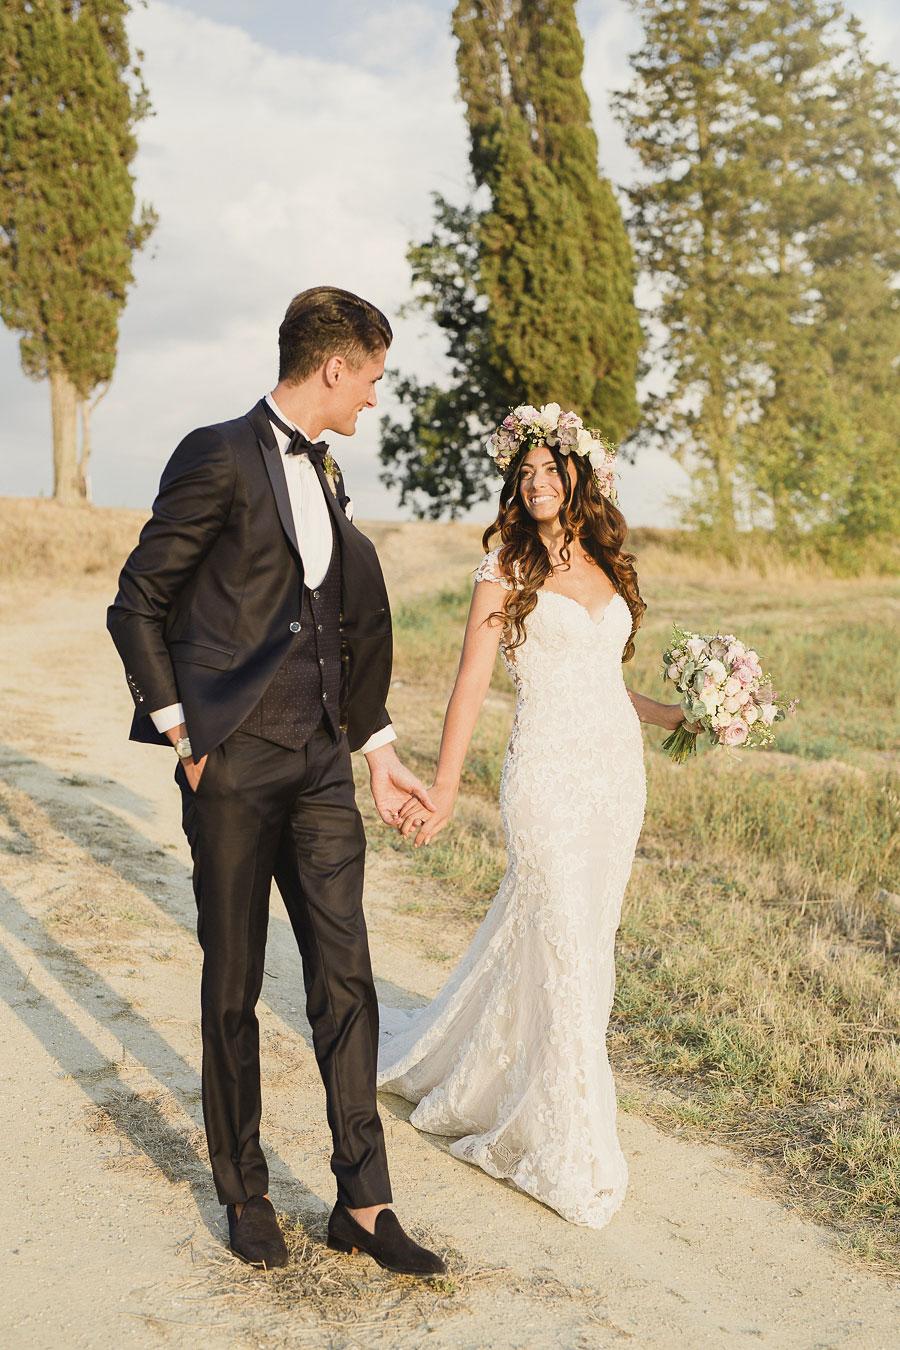 Wedding-Nicholad-and-Federica-Giuseppe-Giovannelli-218